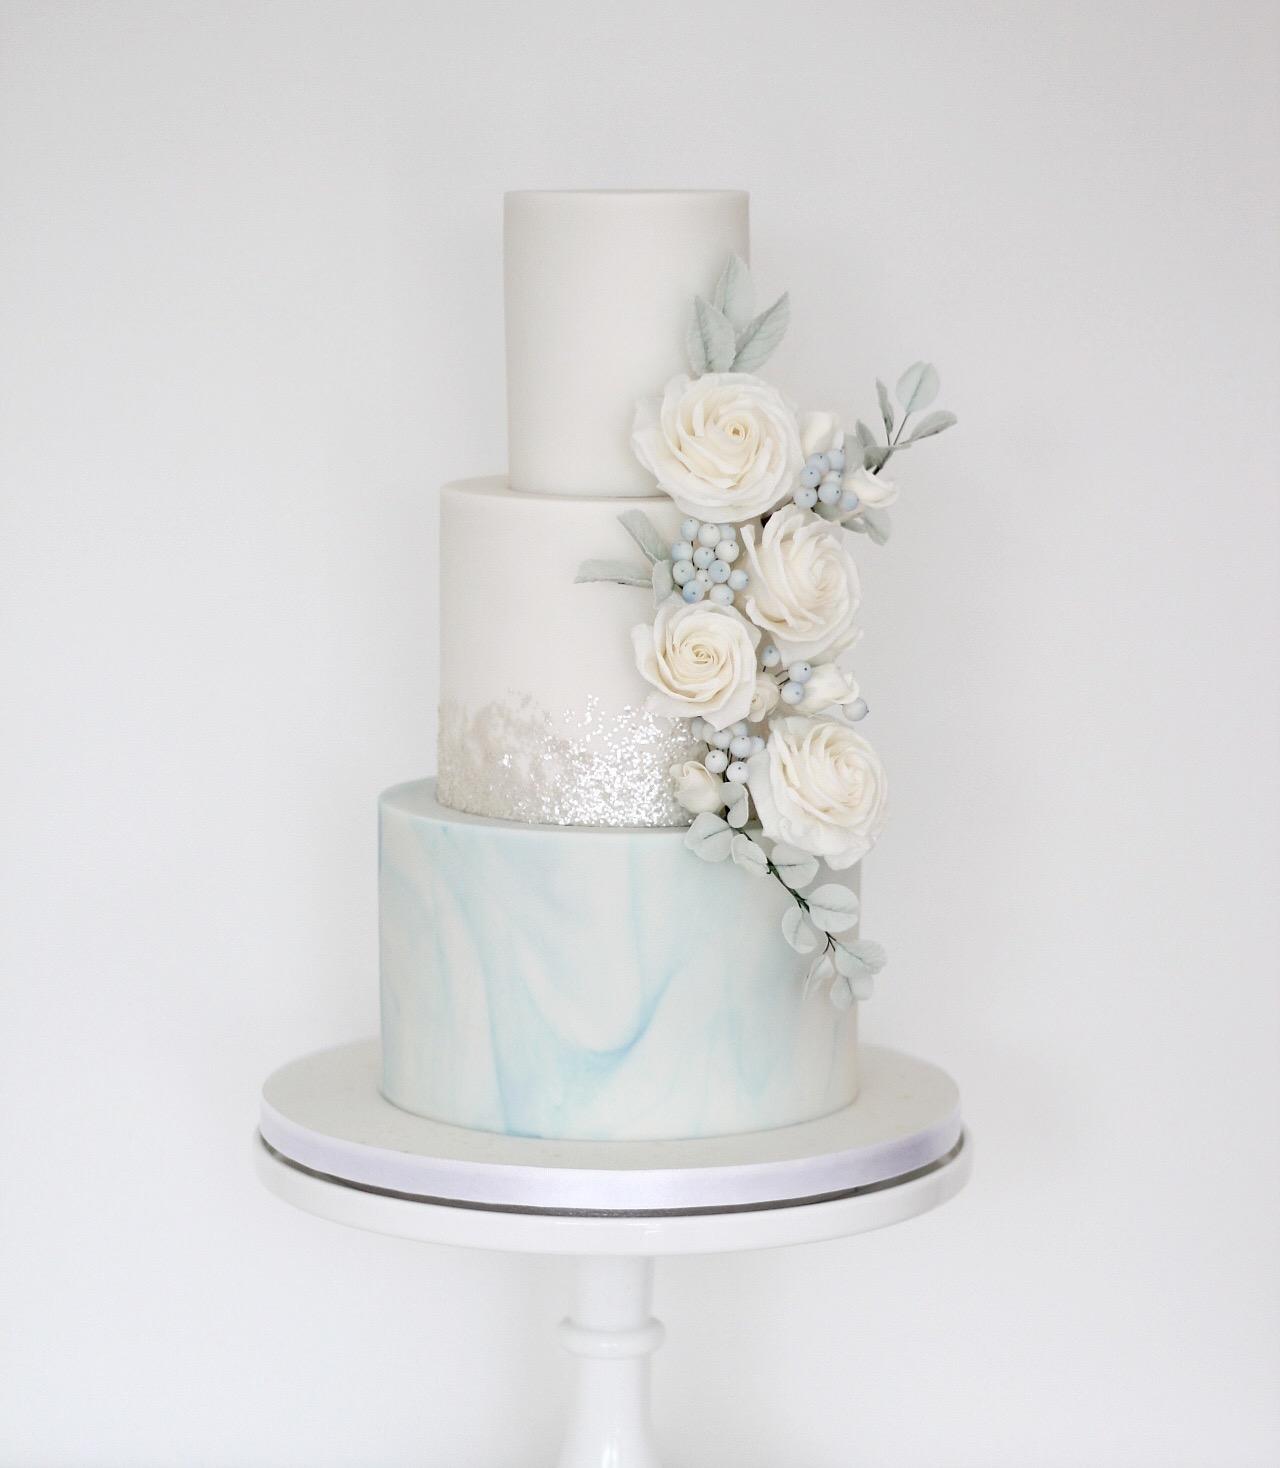 Pale-blue-marble-wedding-cake.JPG